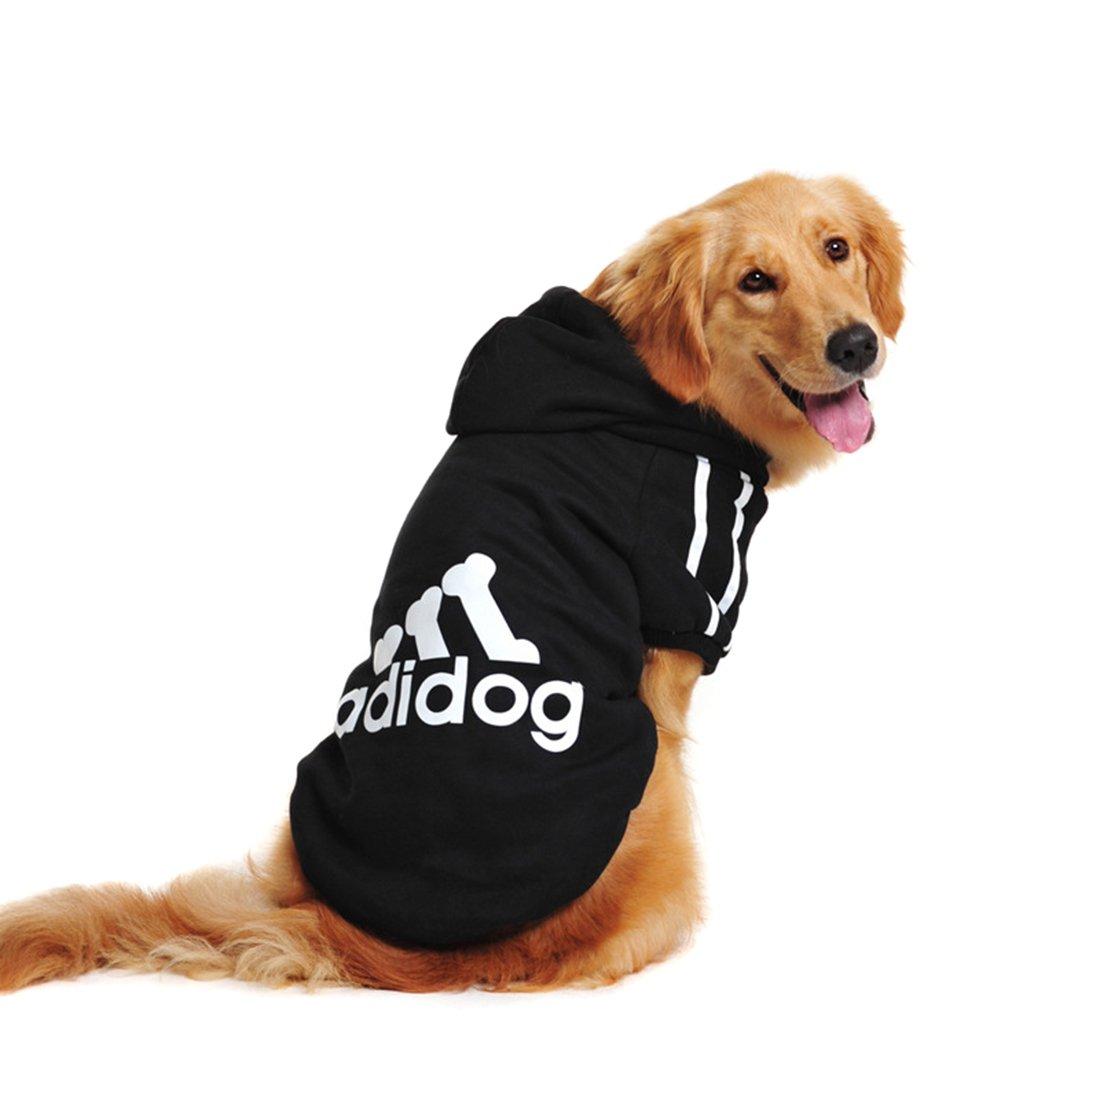 Black 4XL Black 4XL High Quality Spring Autumn Big Dog Clothes Coat Jacket Clothing for Dogs Large Size golden Retriever Labrador 3XL-9XL Adidog Hoodie (Black, 4XL)